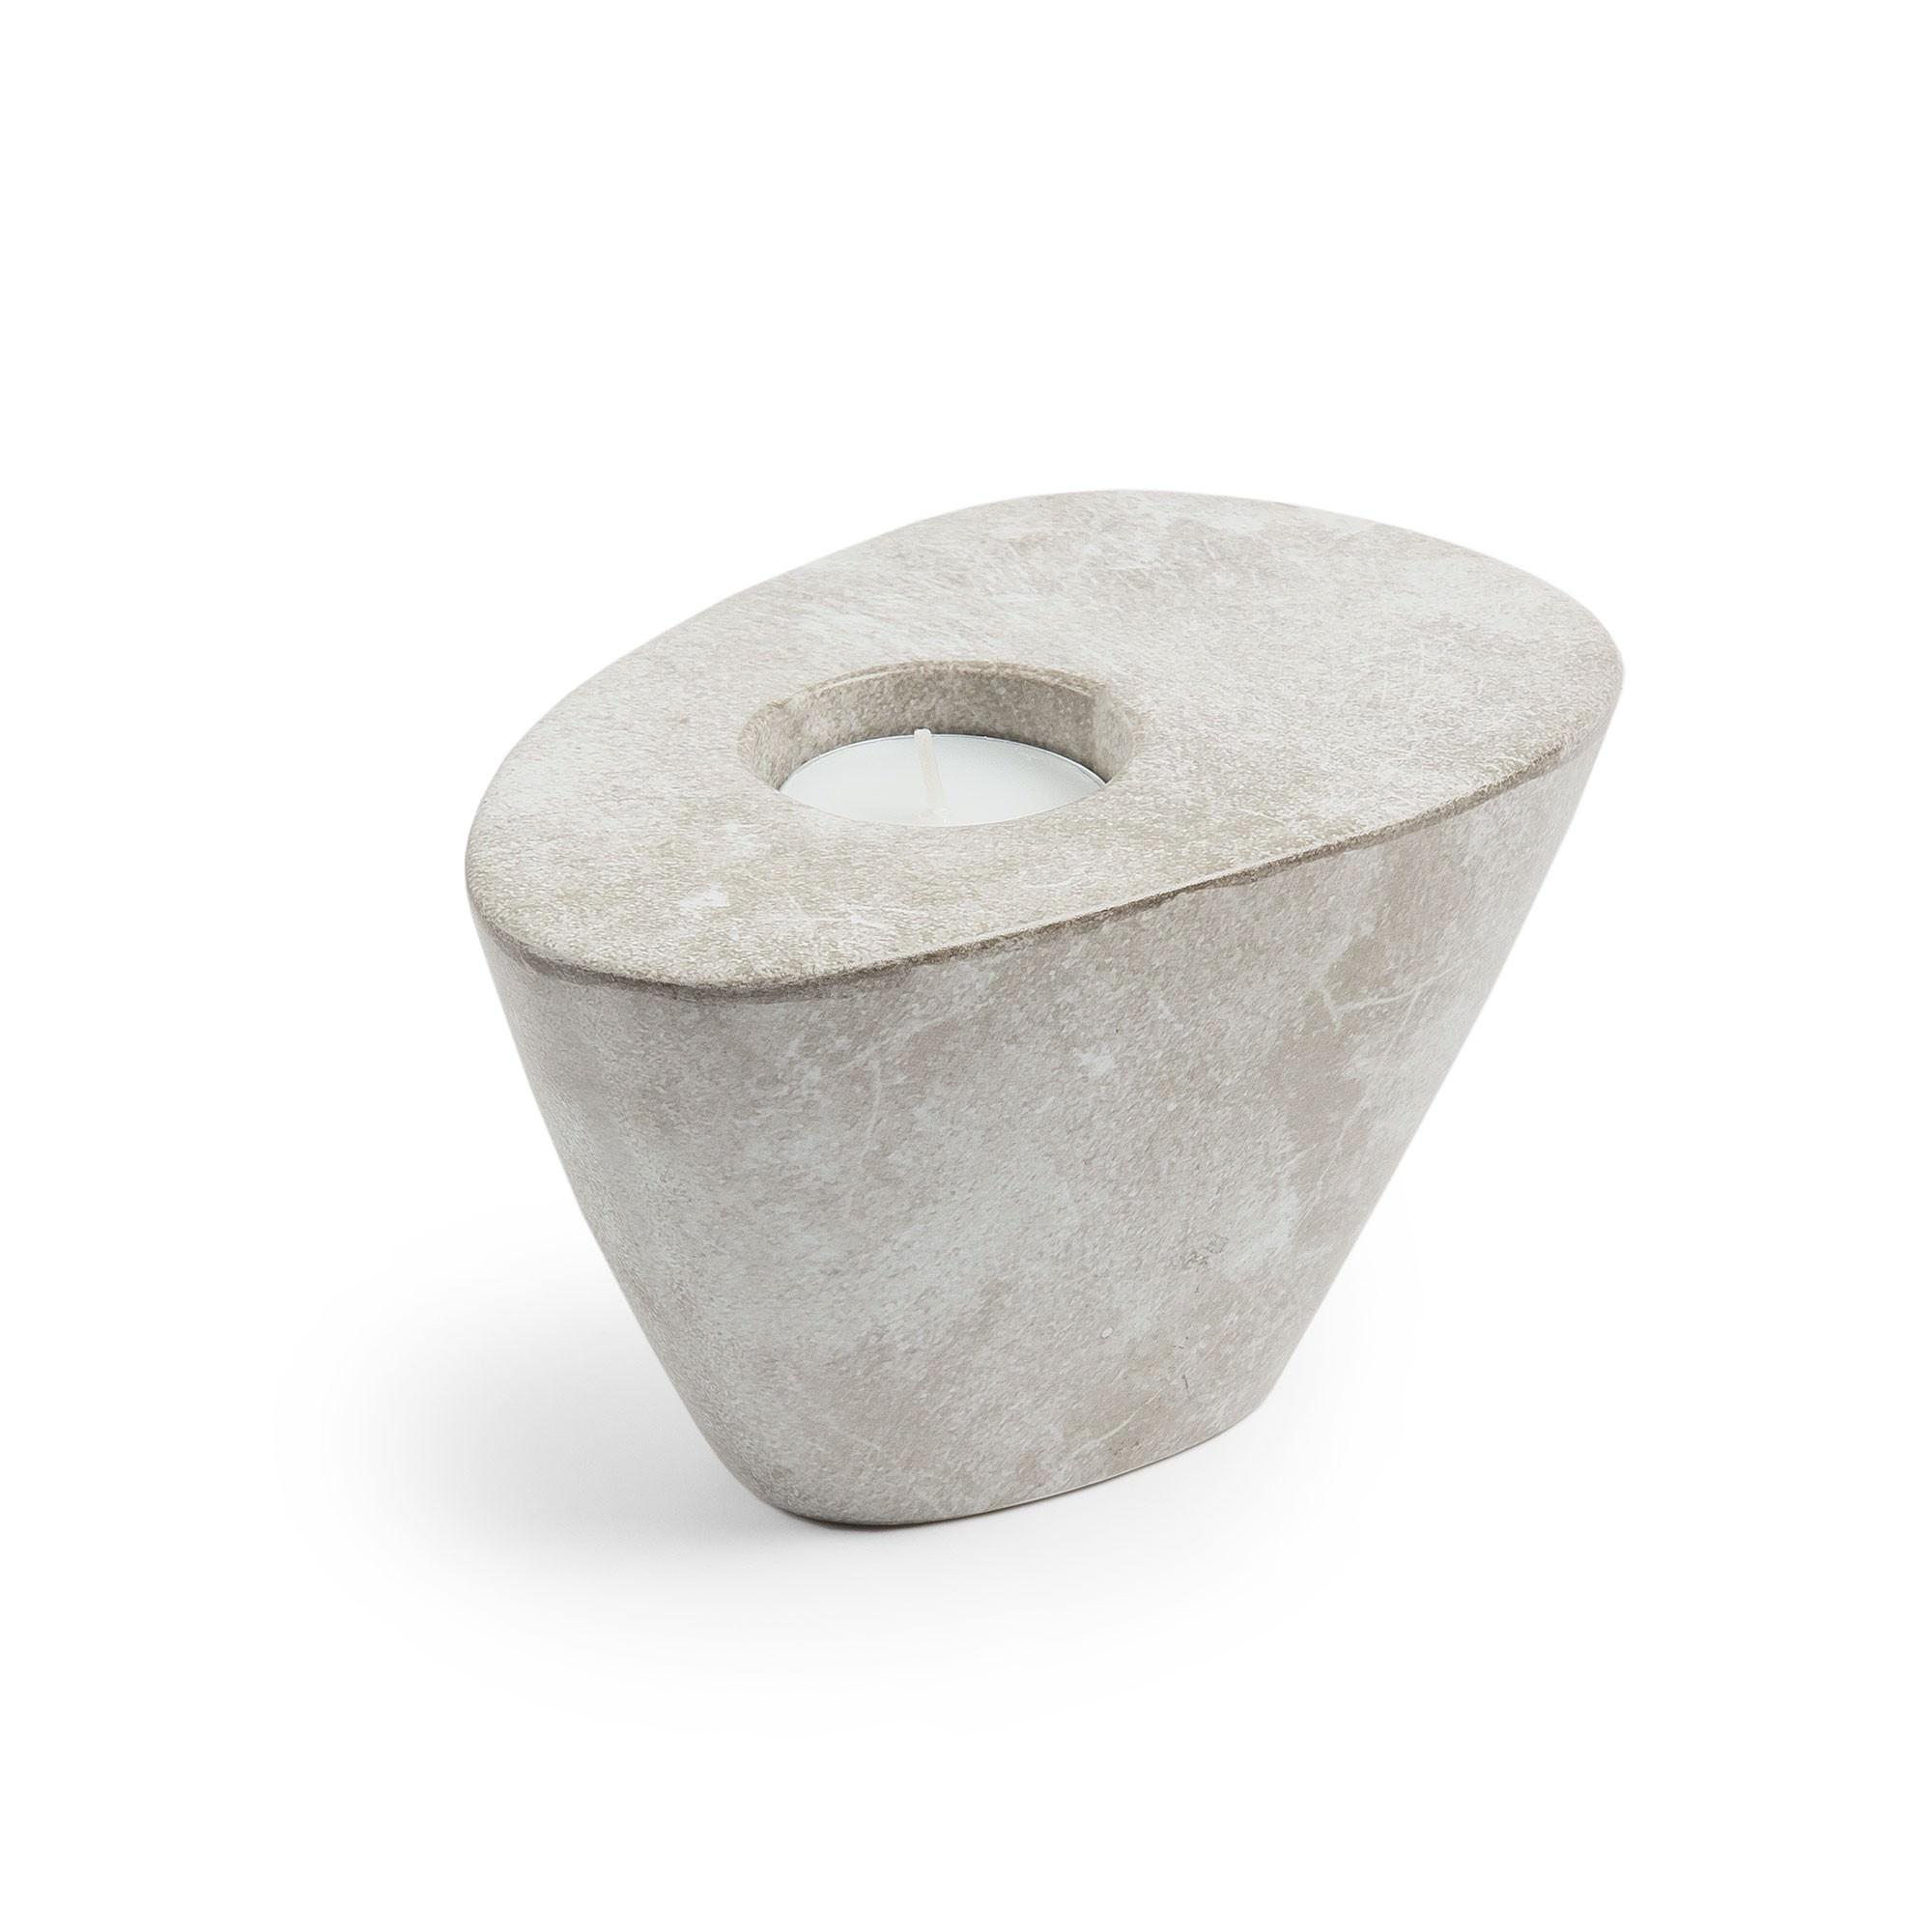 Maloney Ceramic Tealight Holder, Stone